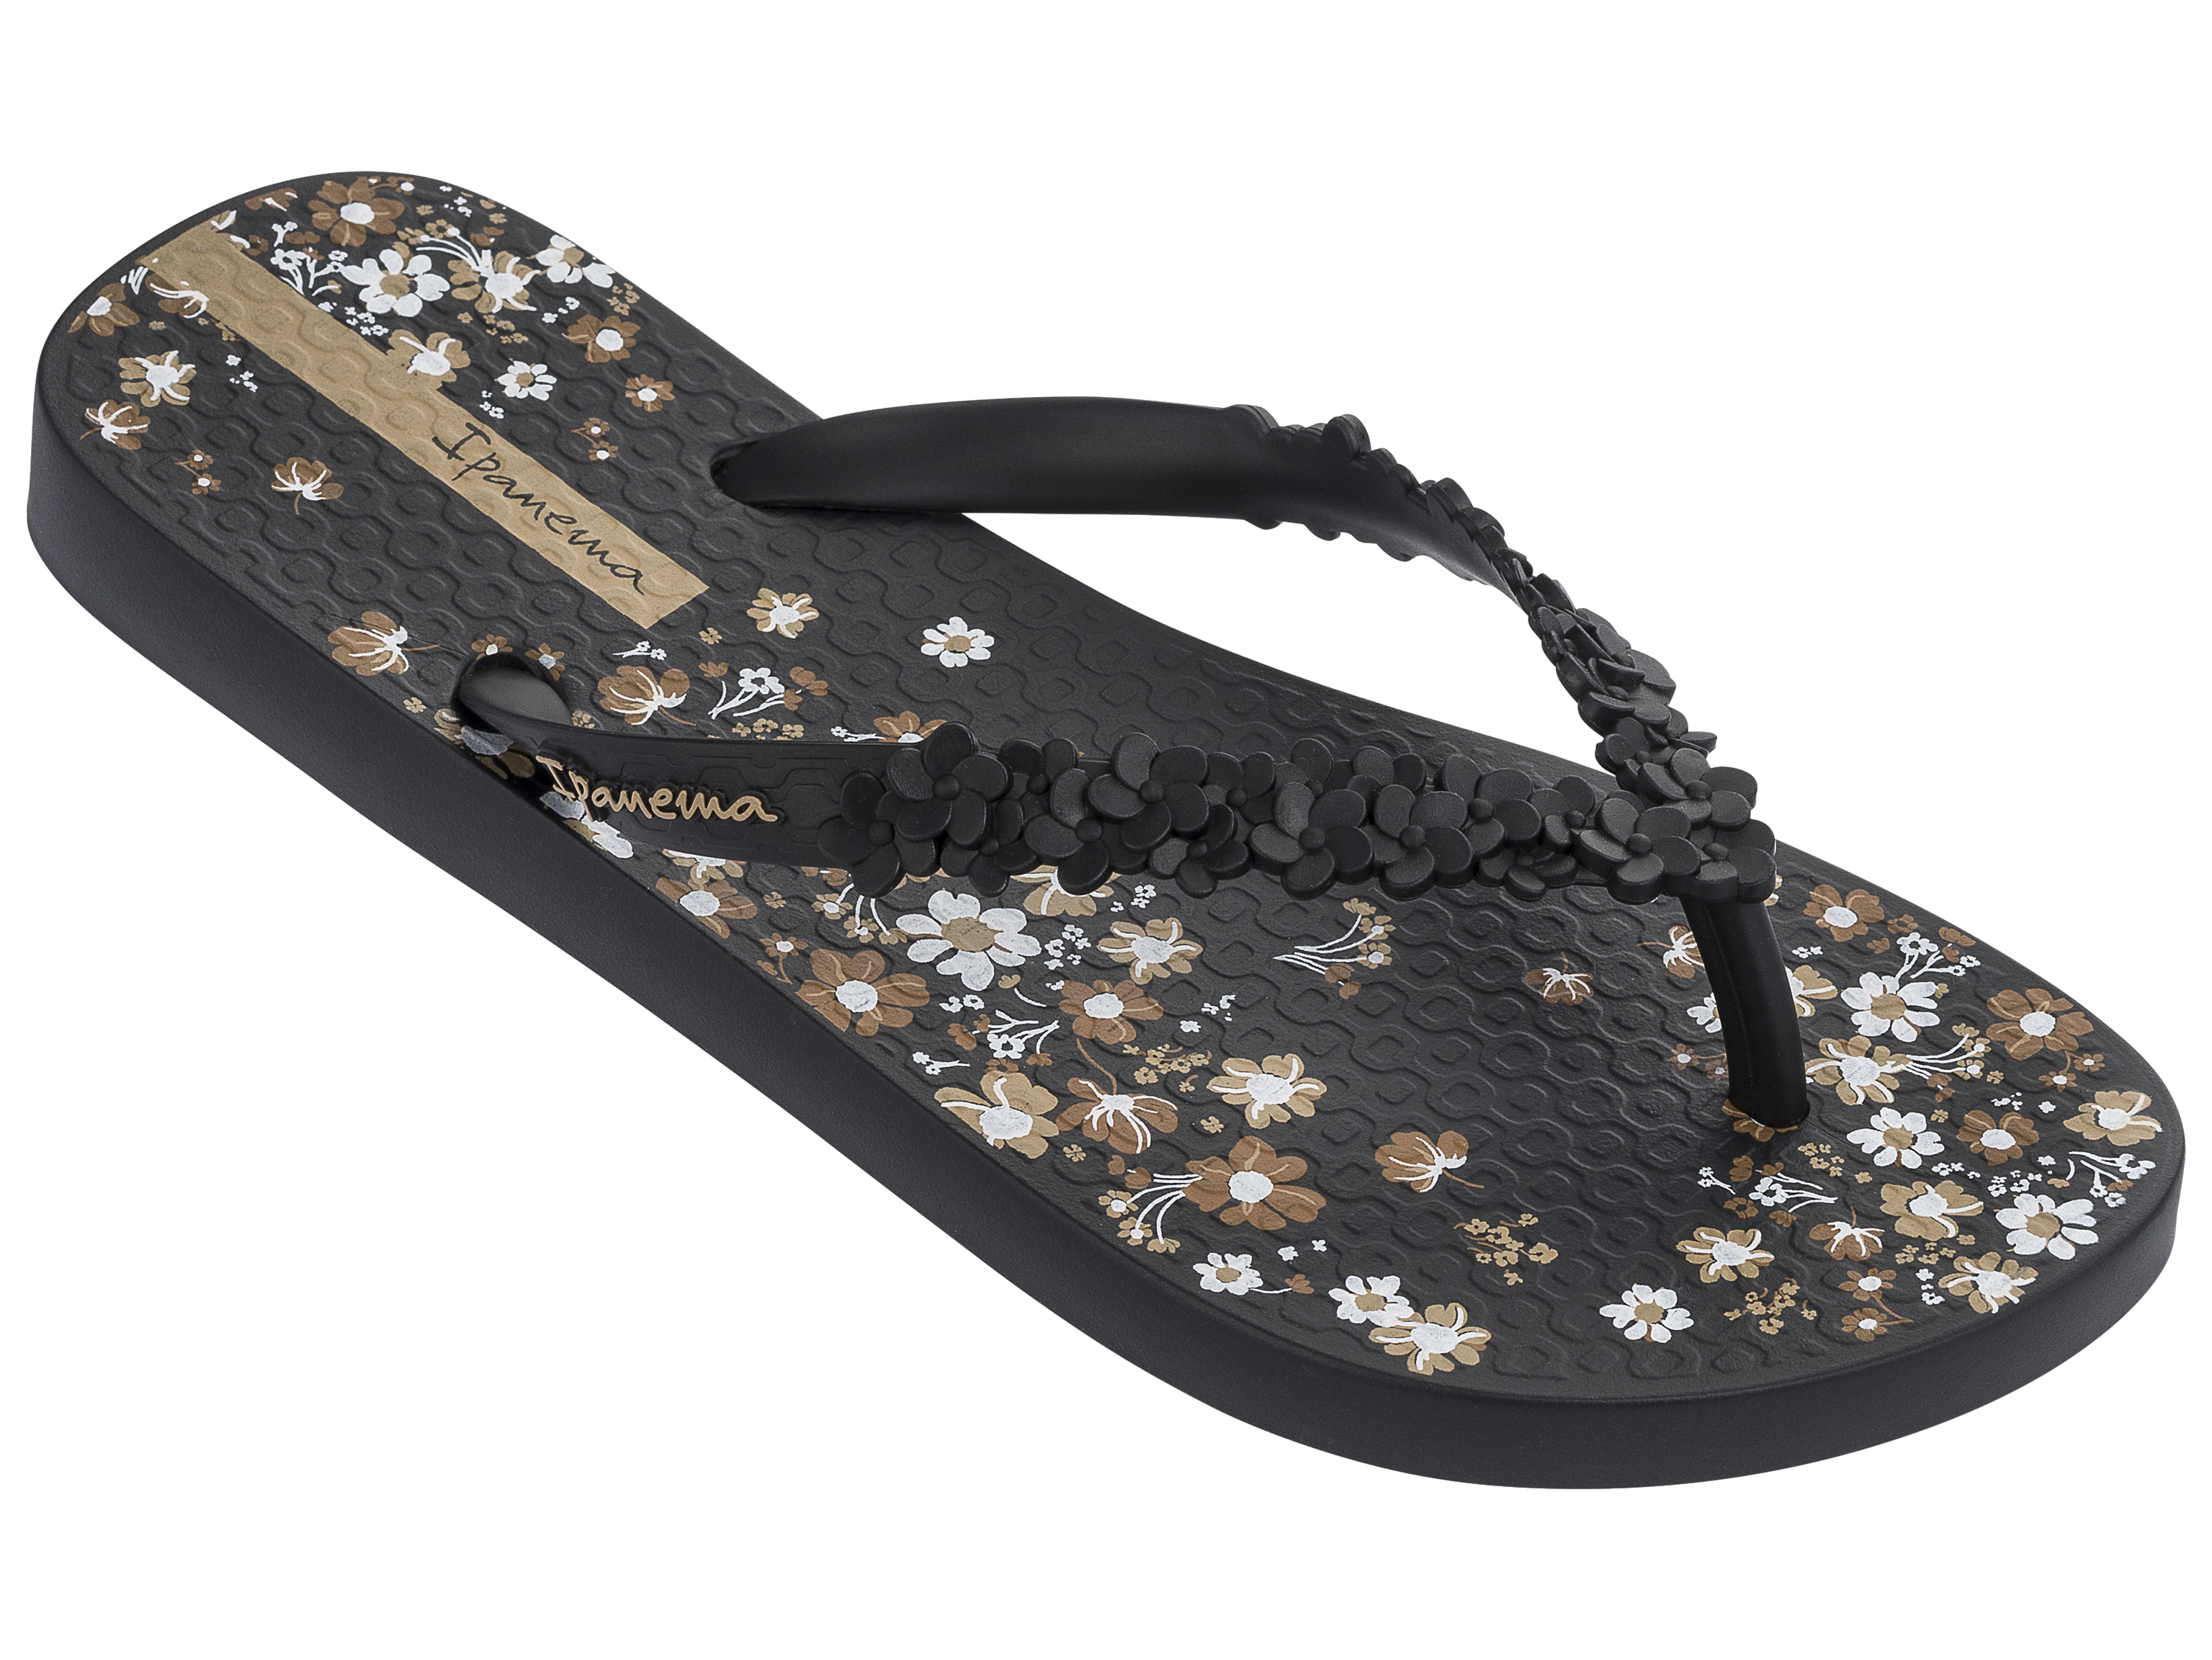 ed44b1a7508 Details about Ipanema Ladies Fashion Floral Flip Flops - Black